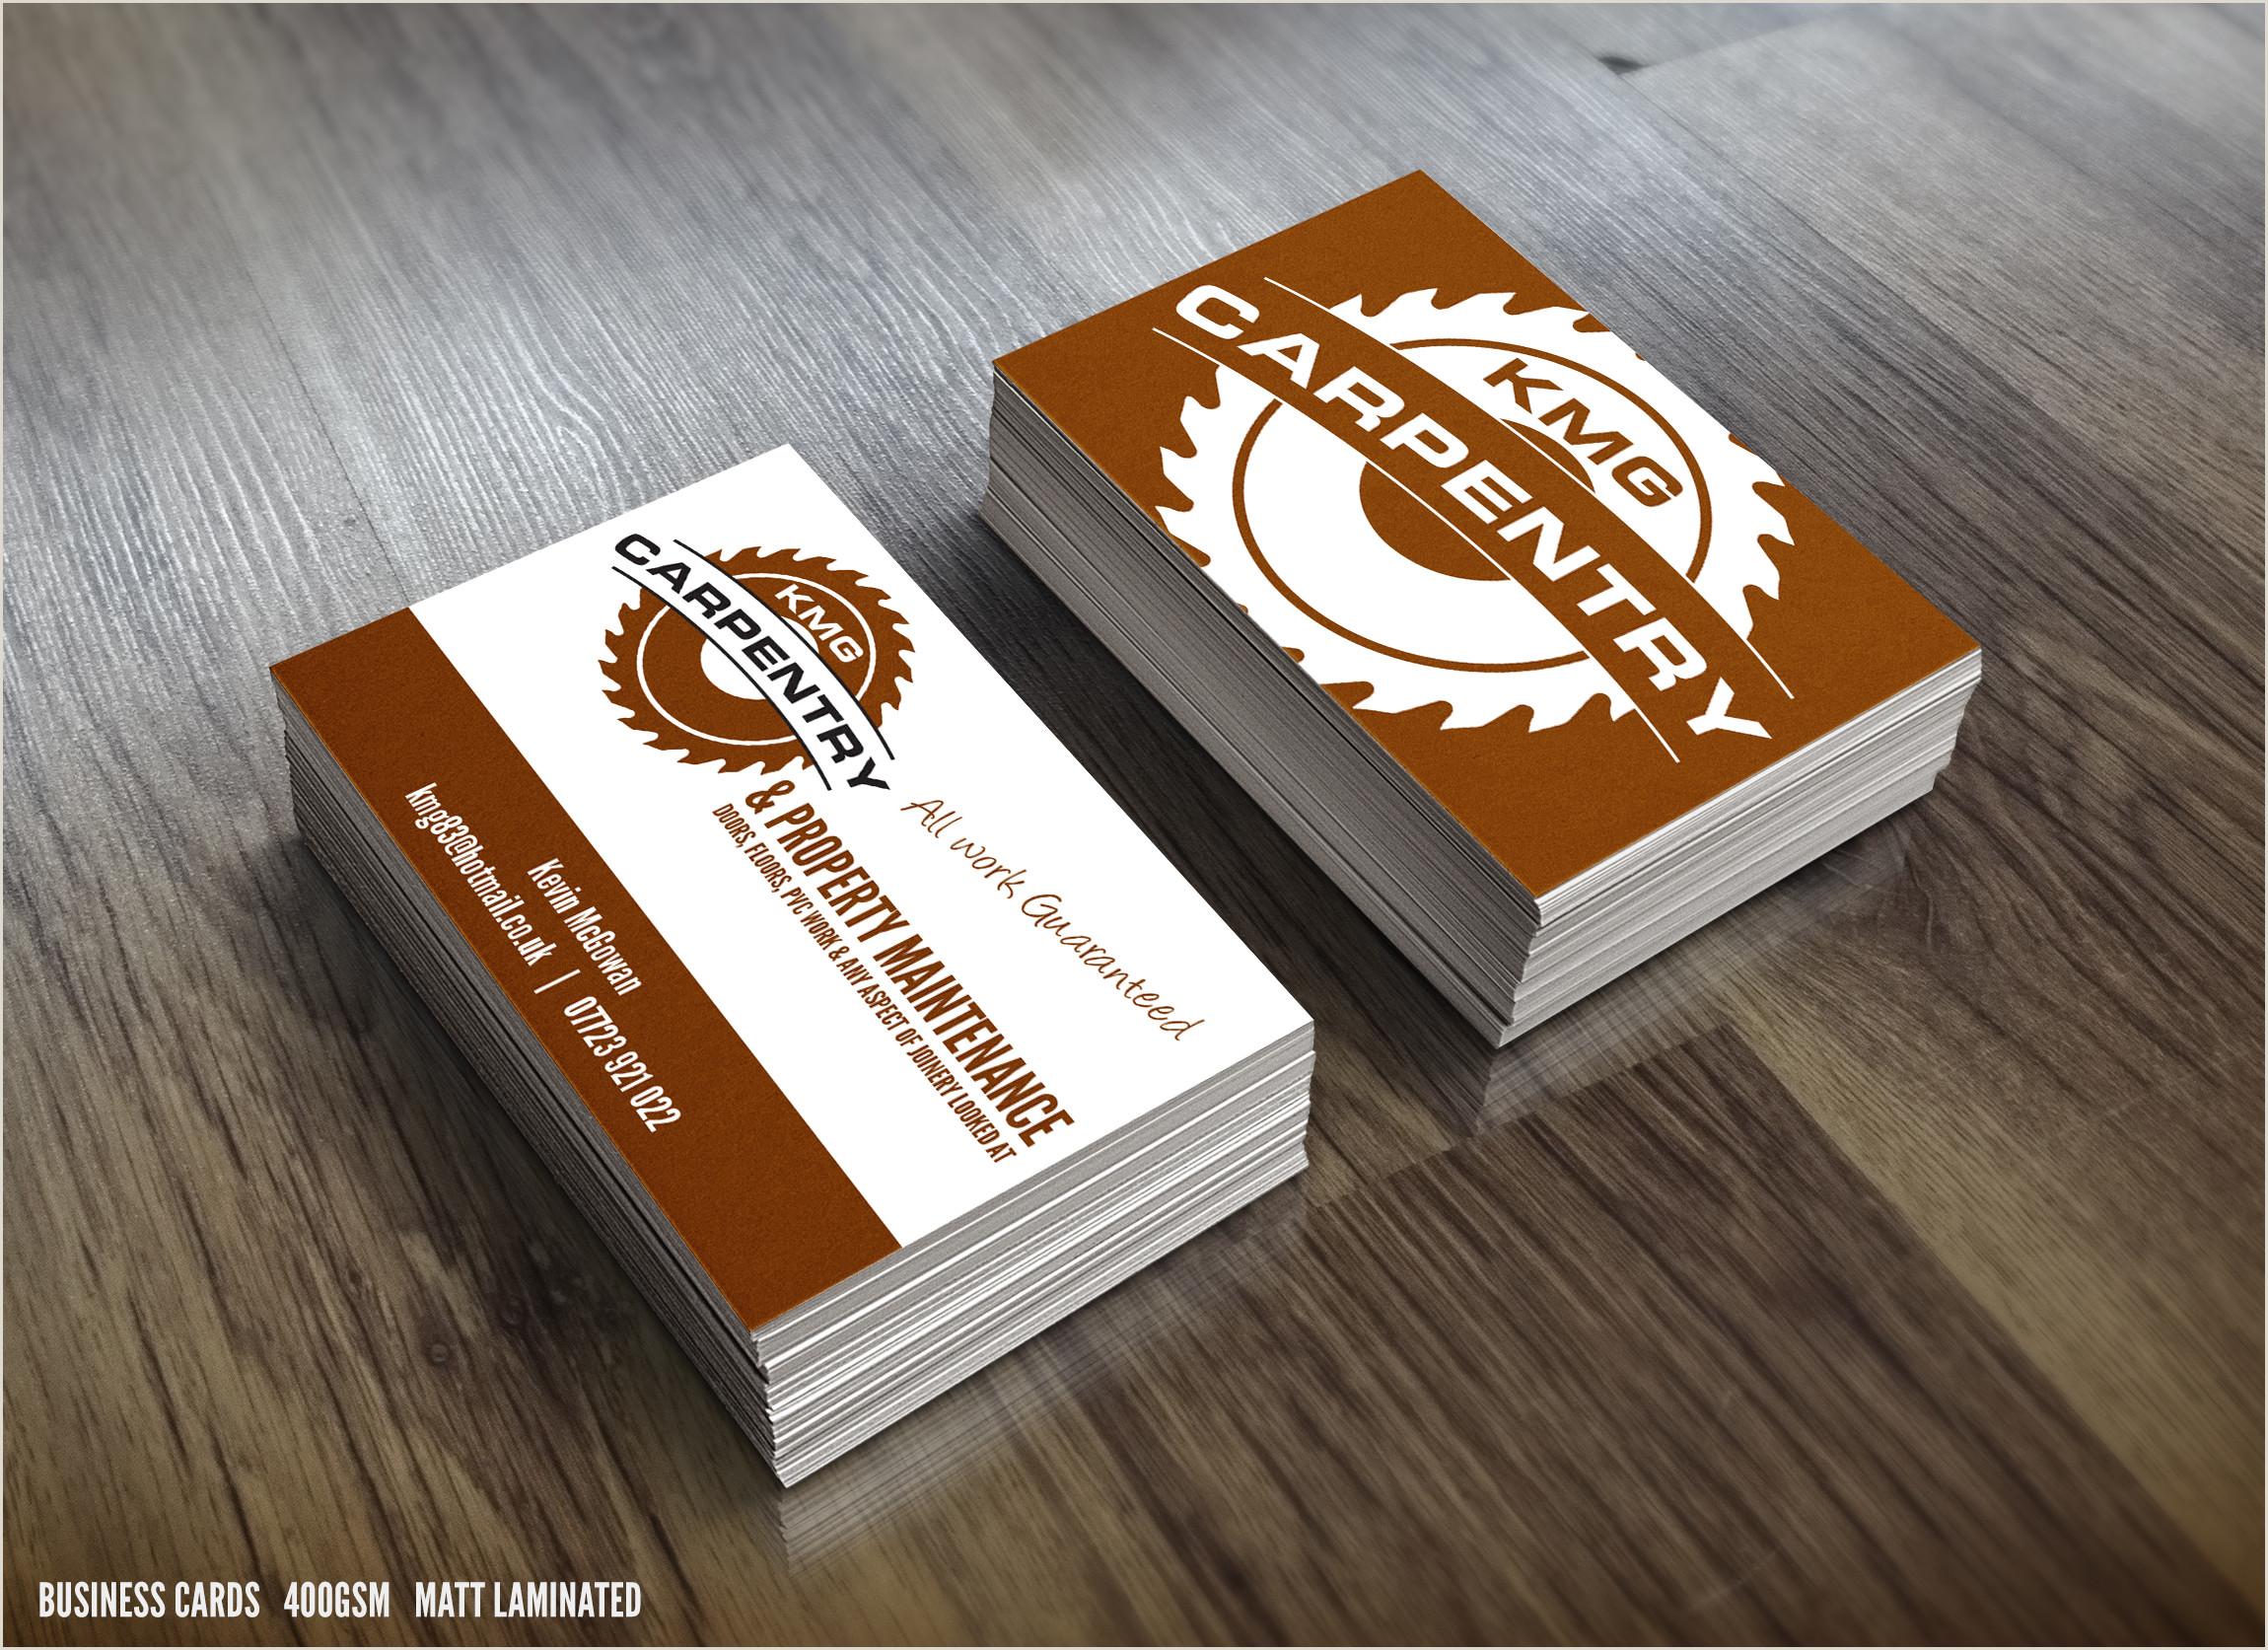 Unique Name Logos For Handyman Business Cards 20 Elegant Handyman Logos For Business Cards